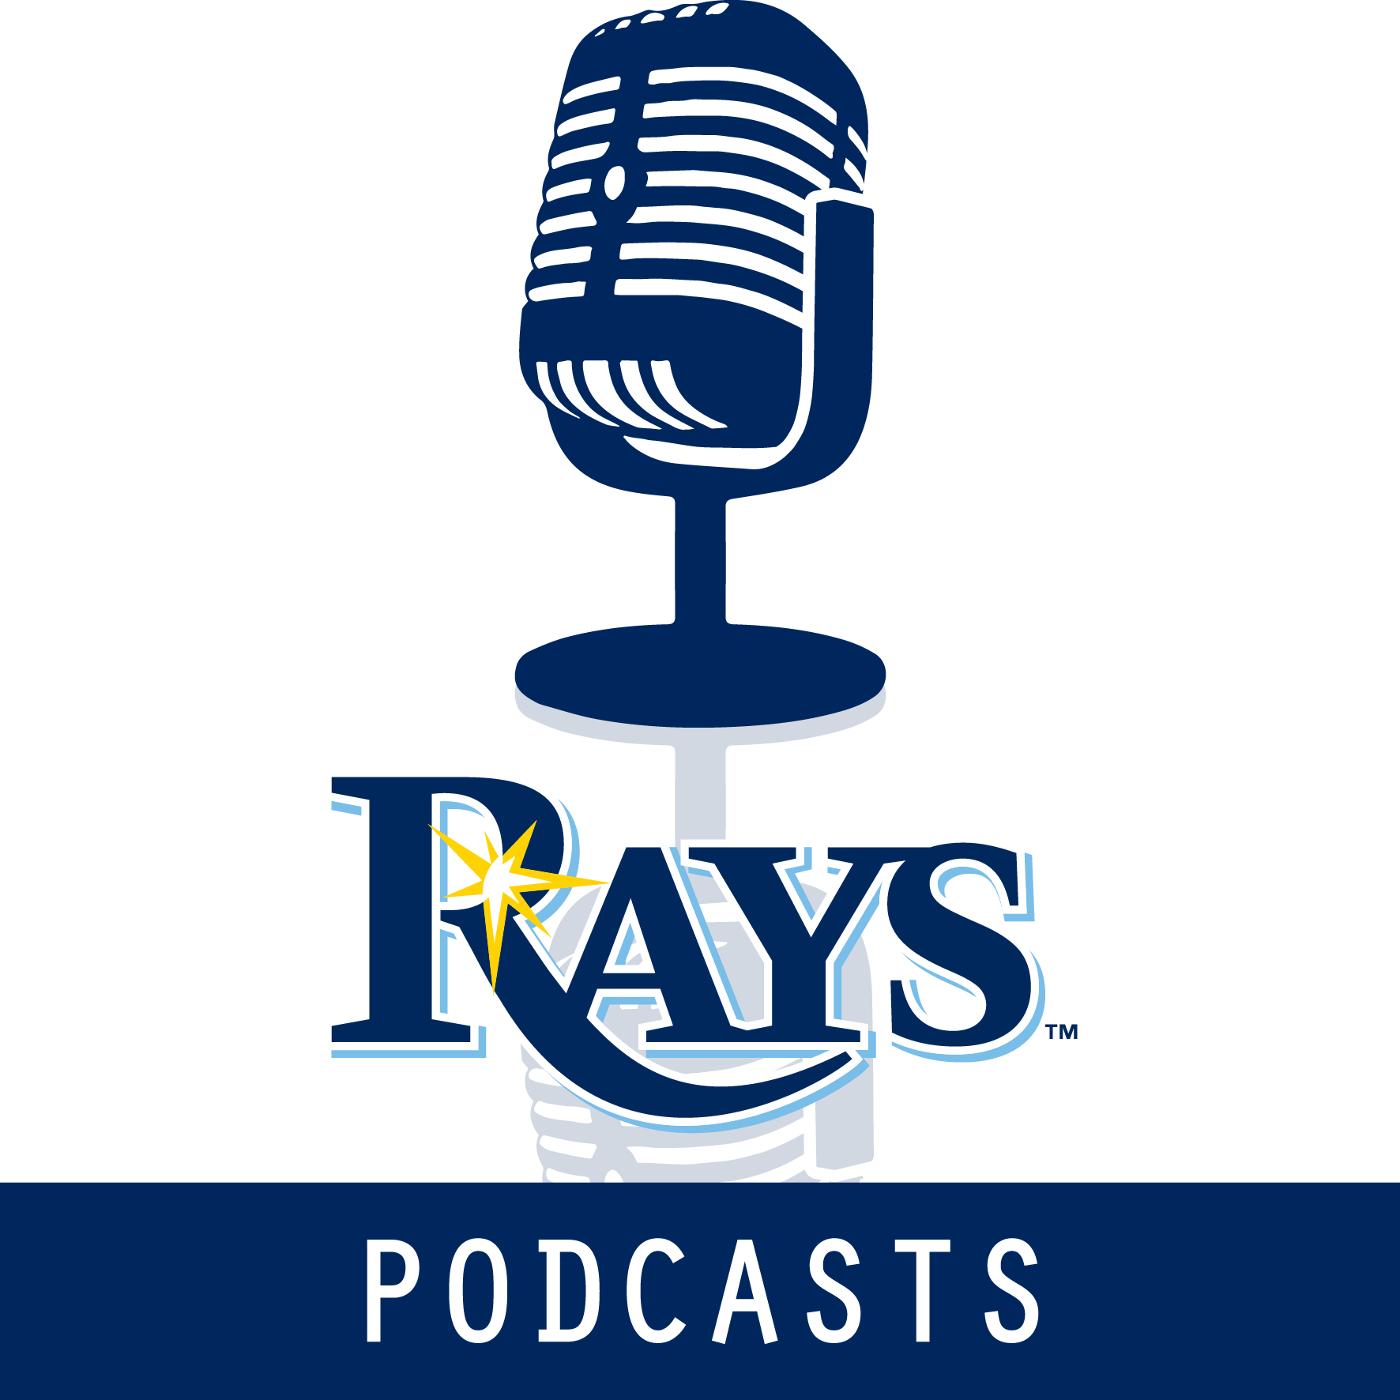 <![CDATA[Tampa Bay Rays Podcast]]>